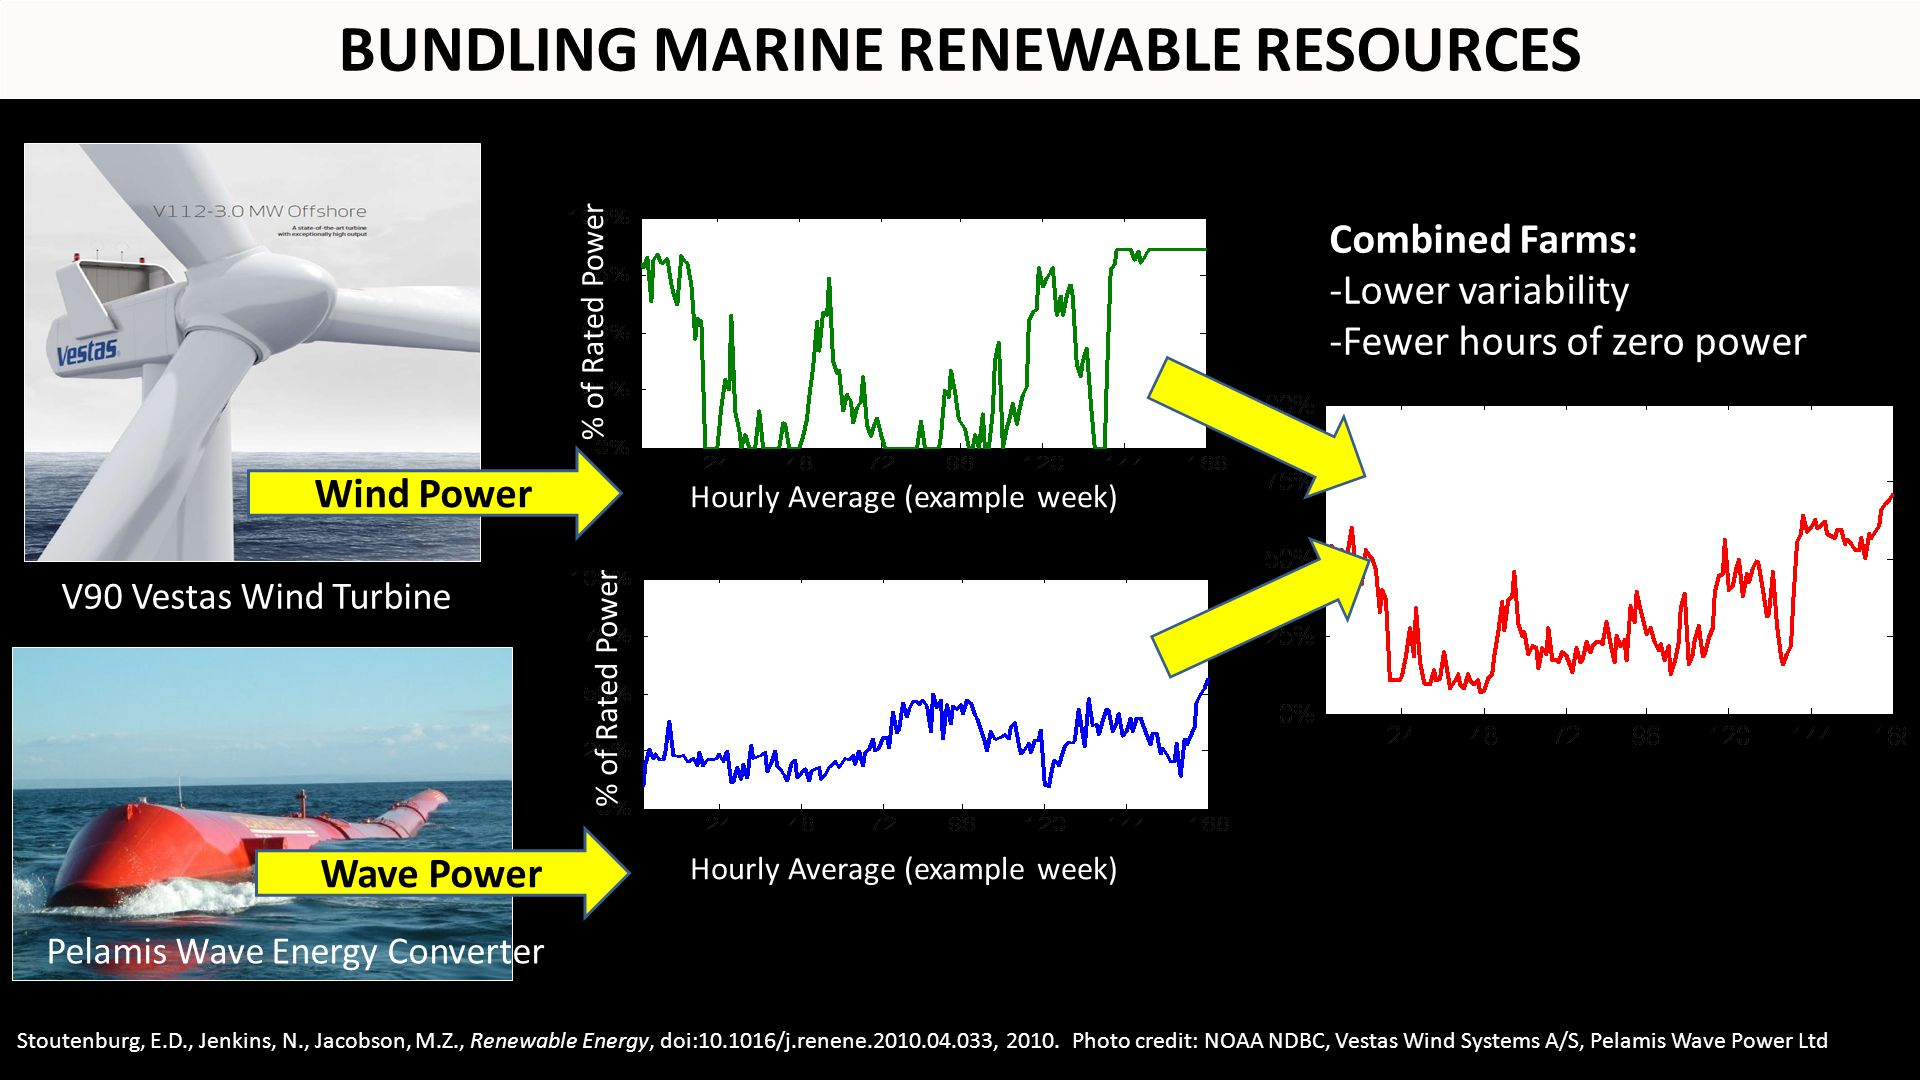 Wind Power Wave Power V90 Vestas Wind Turbine Pelamis Wave Energy Converter Stoutenburg, E.D., Jenkins, N., Jacobson, M.Z., Renewable Energy, doi:10.1016/j.renene.2010.04.033, 2010.